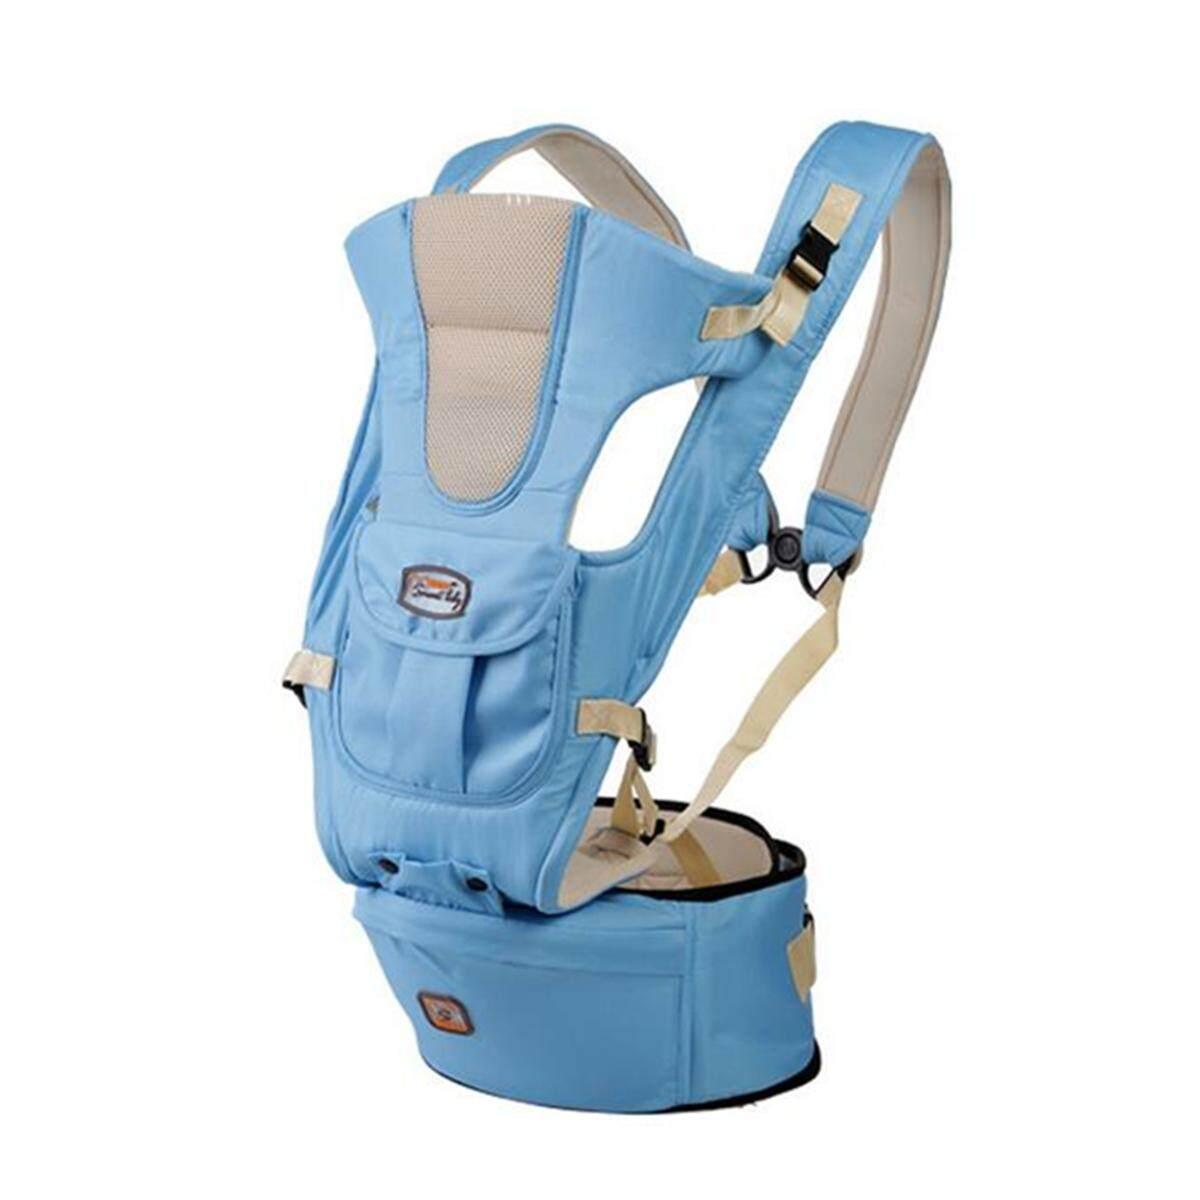 Baby Carrier Infant Kid Sling Adjustable Breathable Ergonomic Wrap Backpack Newblue By Moonbeam.